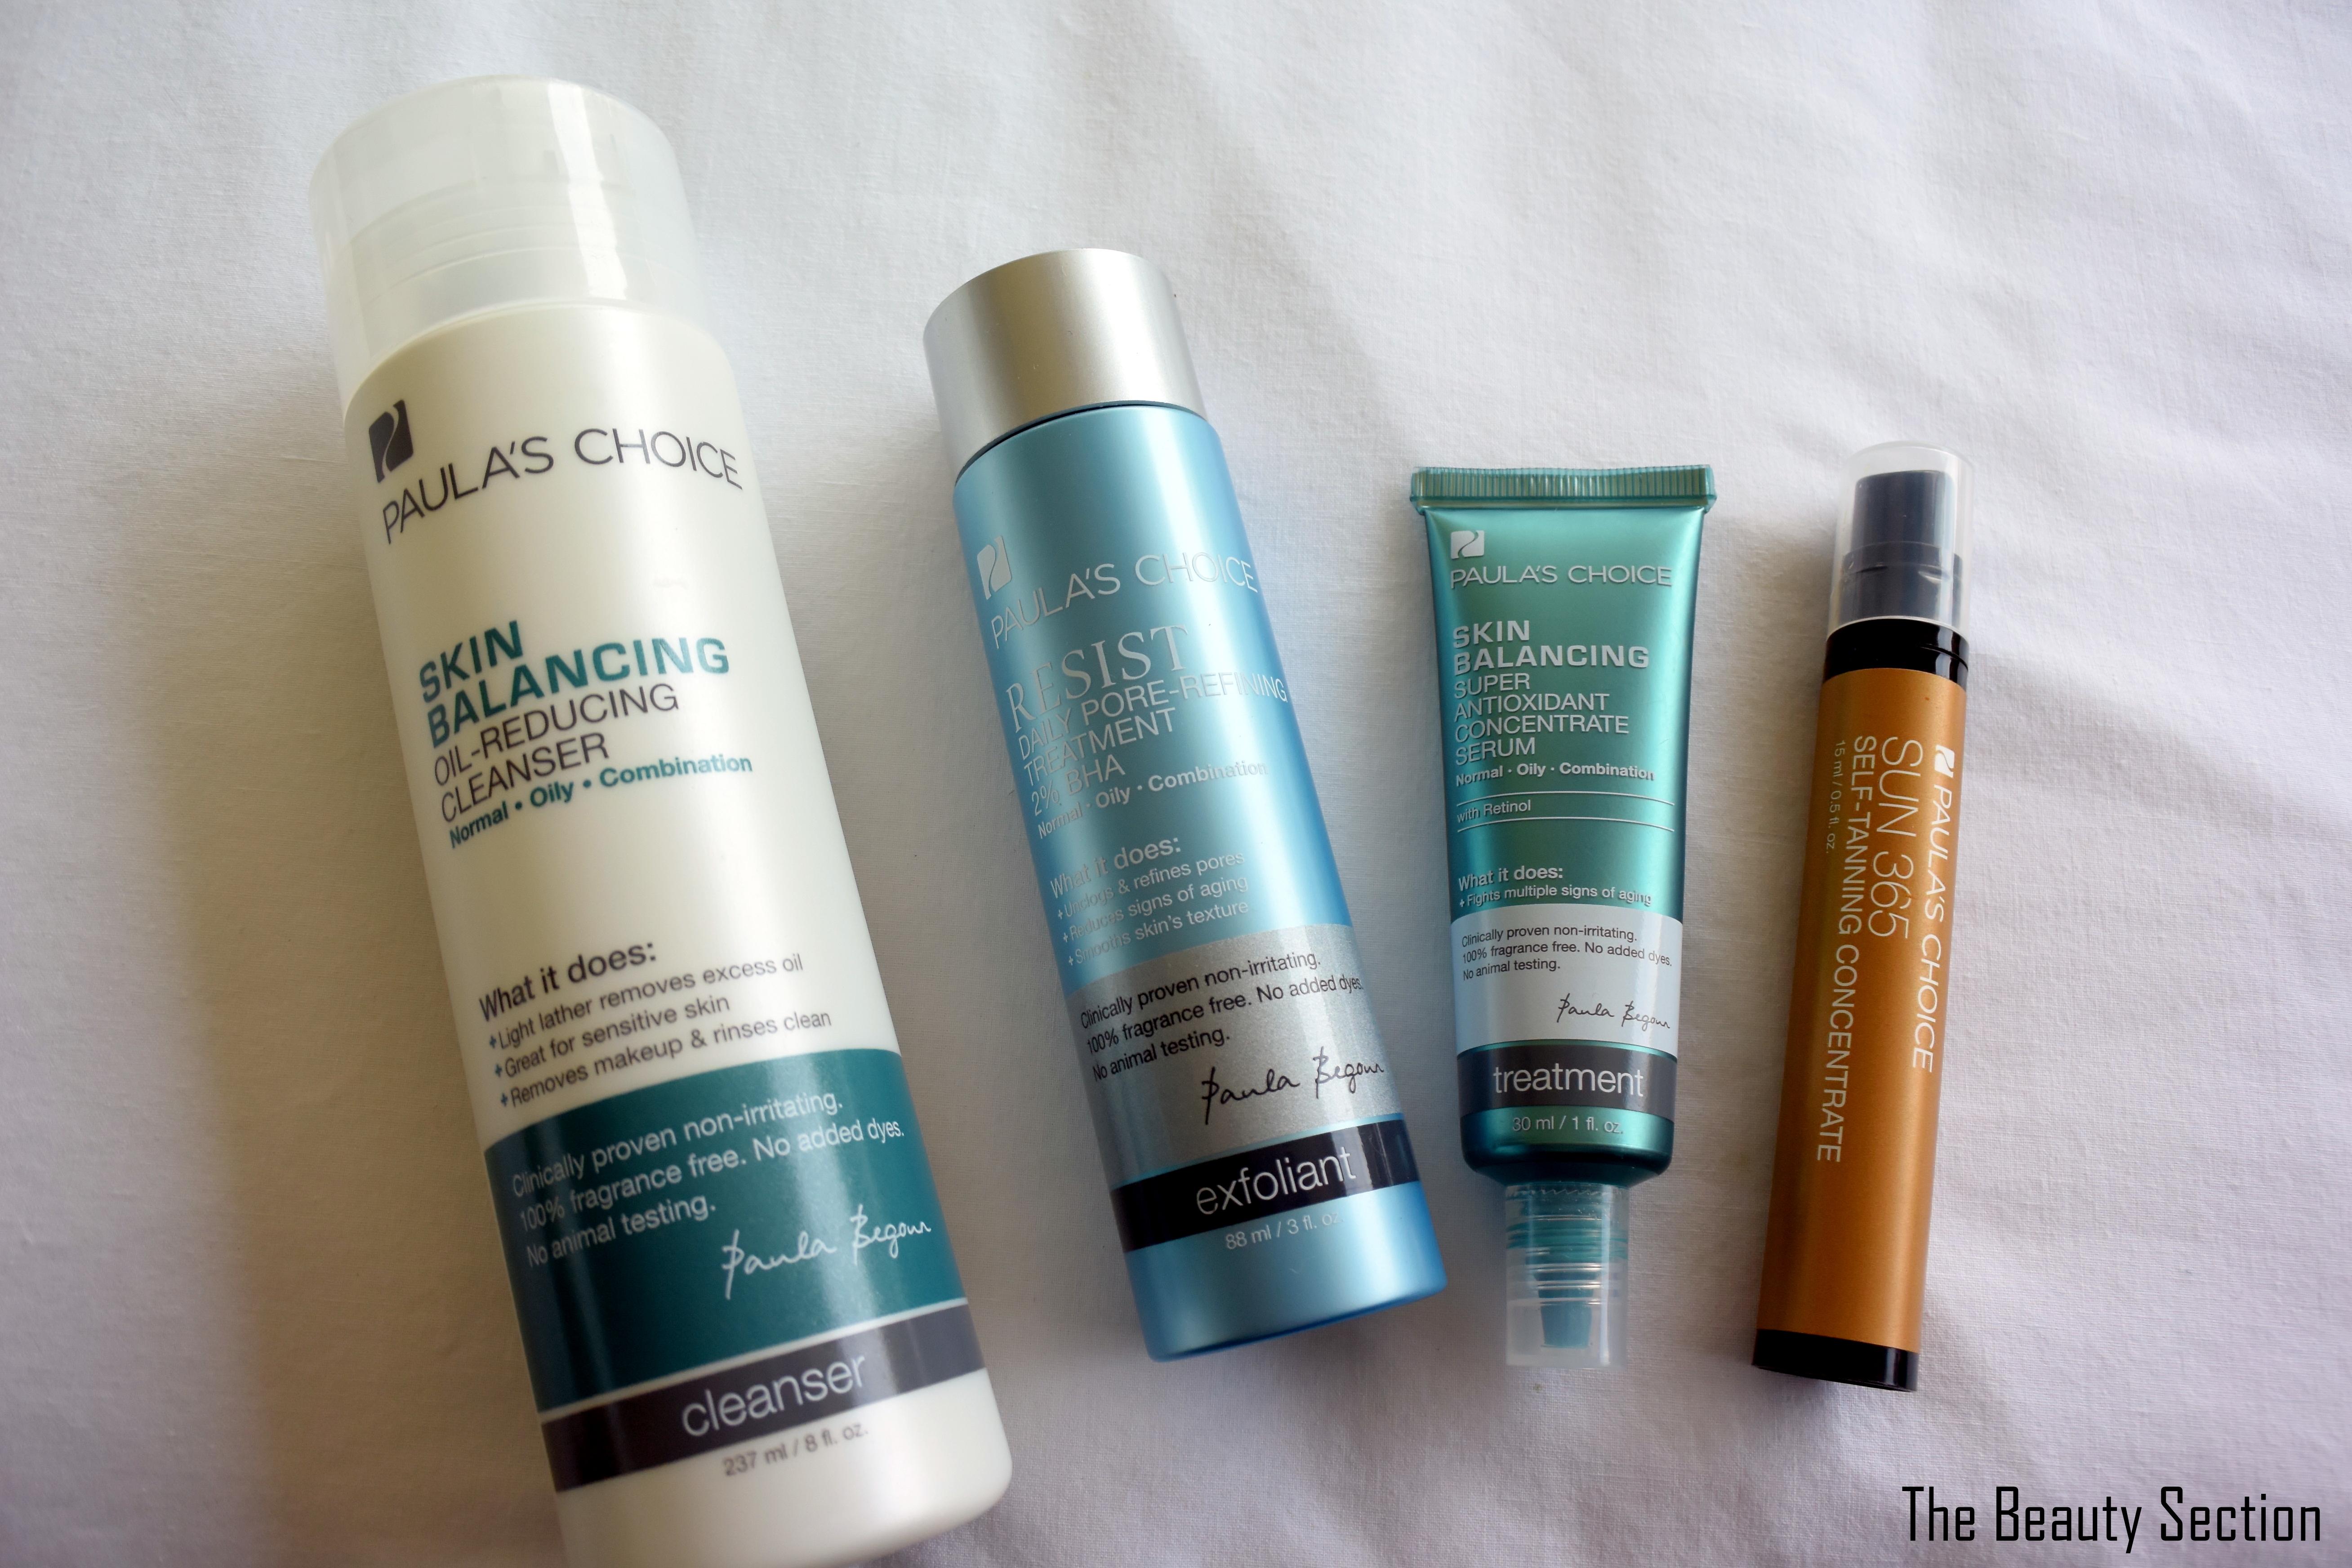 Paula's Choice Skincare for Oily Skin + Self Tanner